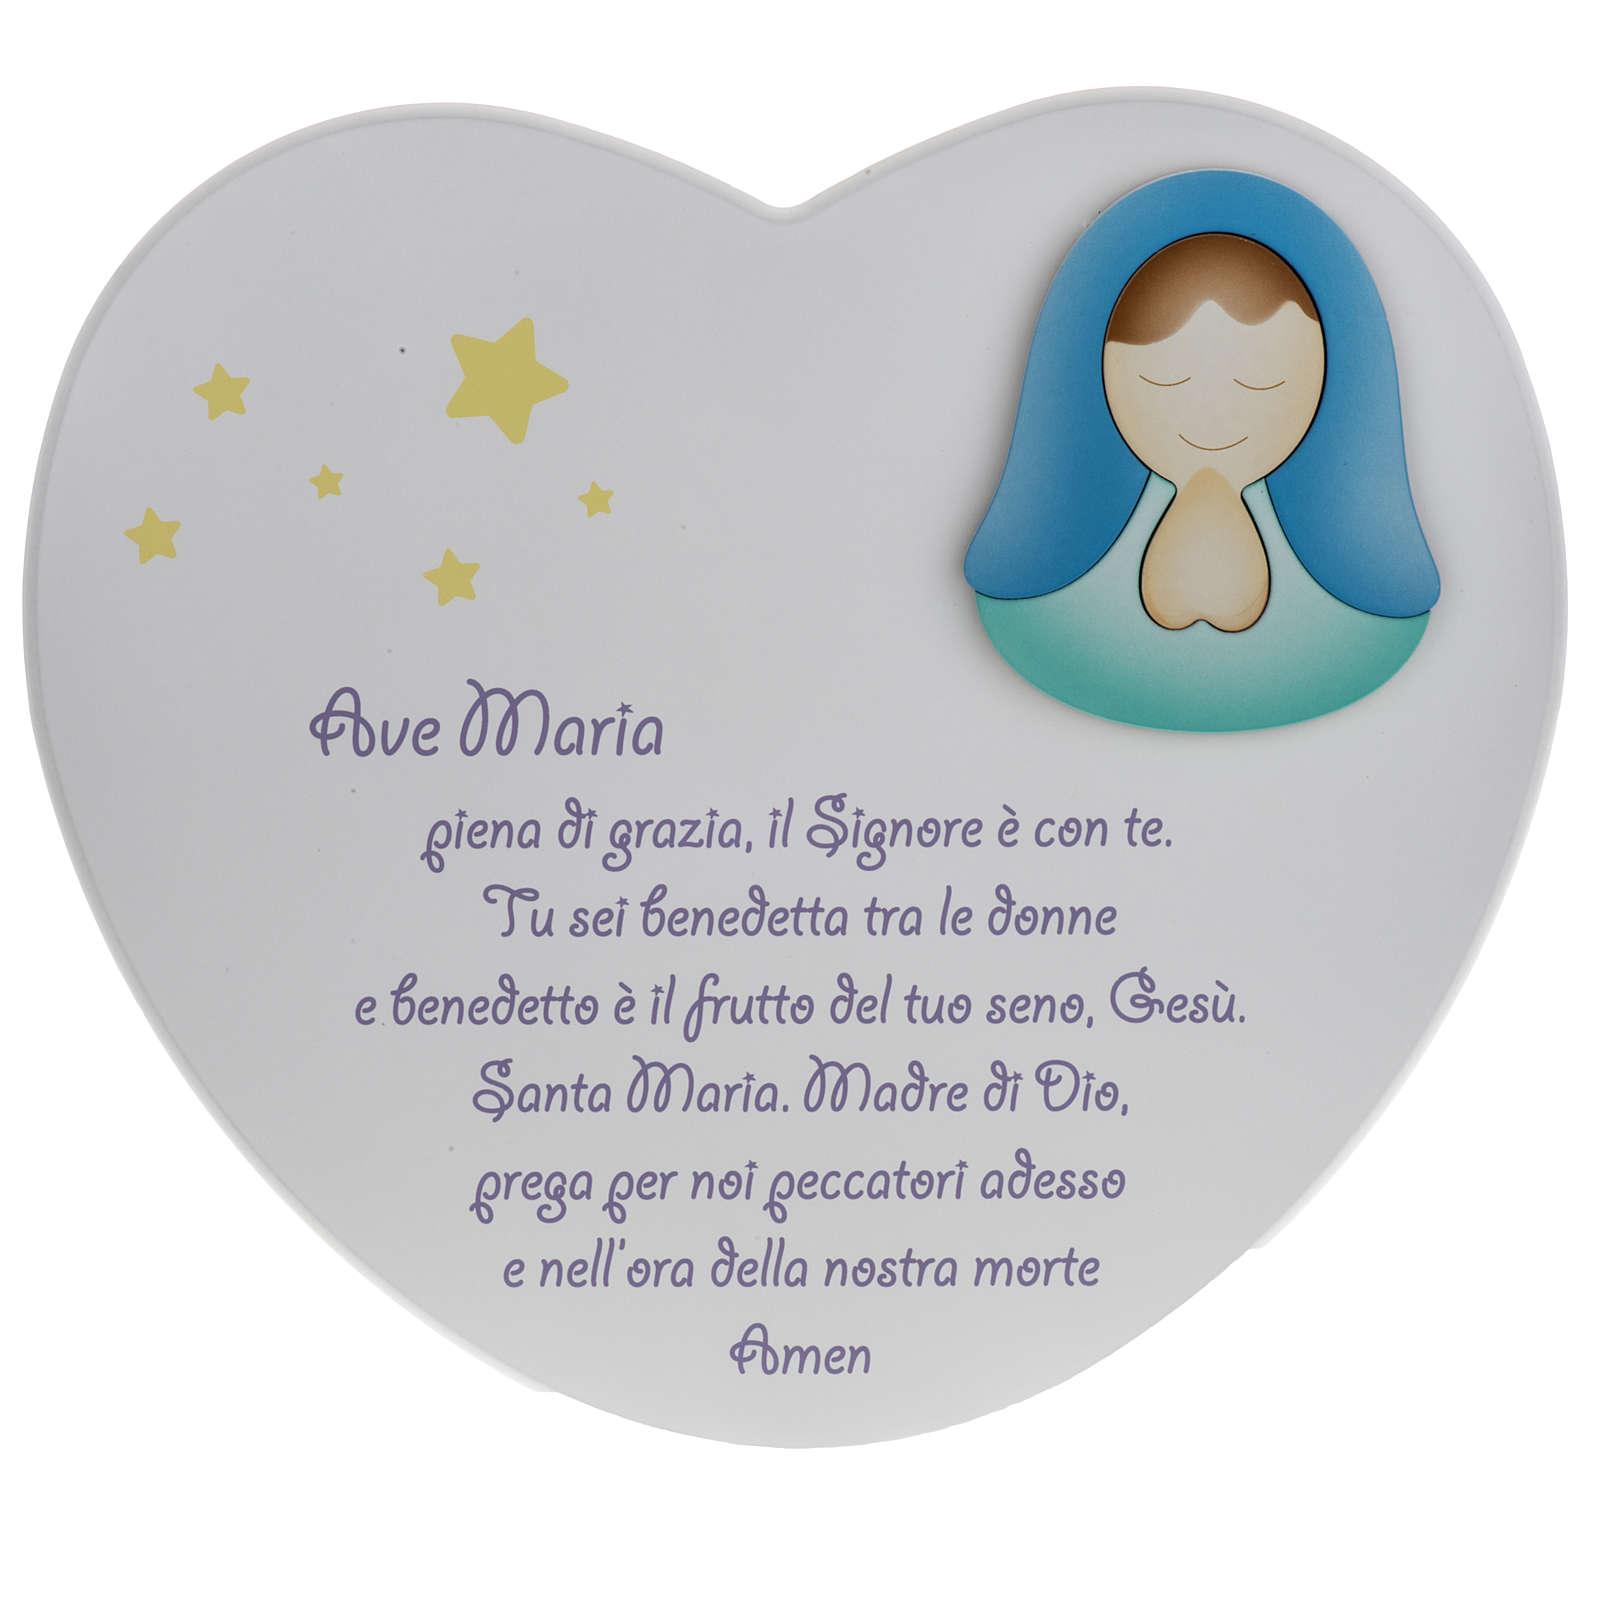 Corazón cántico Ave María Azur Loppiano 3